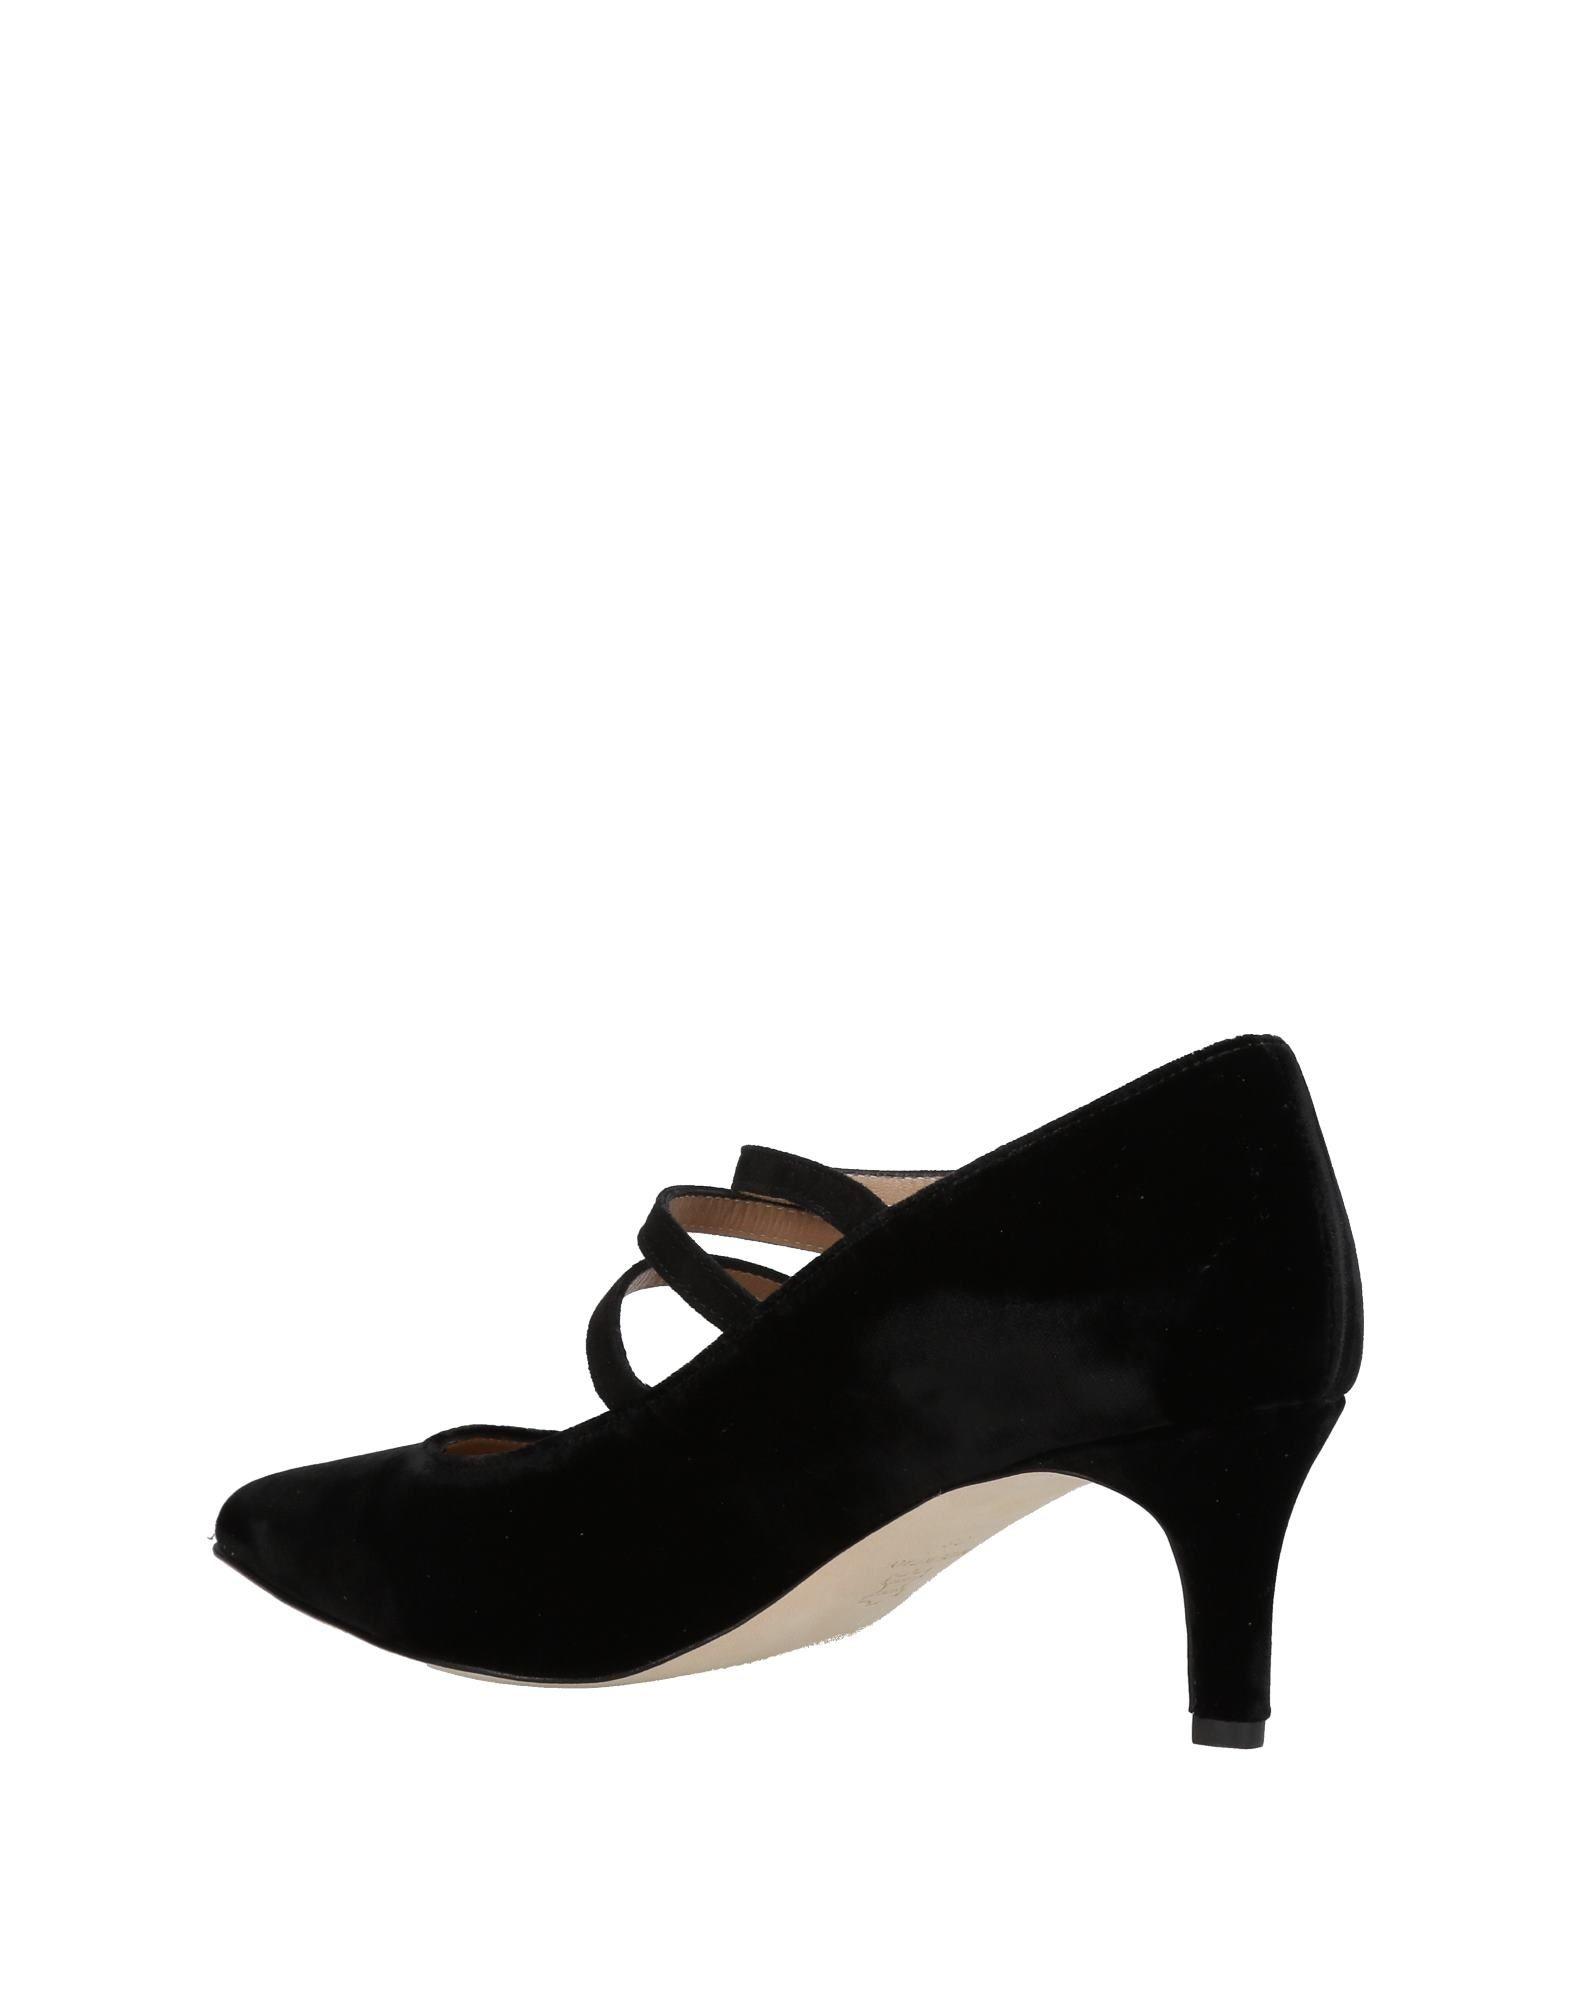 Cristina Millotti Pumps Damen  Schuhe 11458077PX Gute Qualität beliebte Schuhe  a86ca6